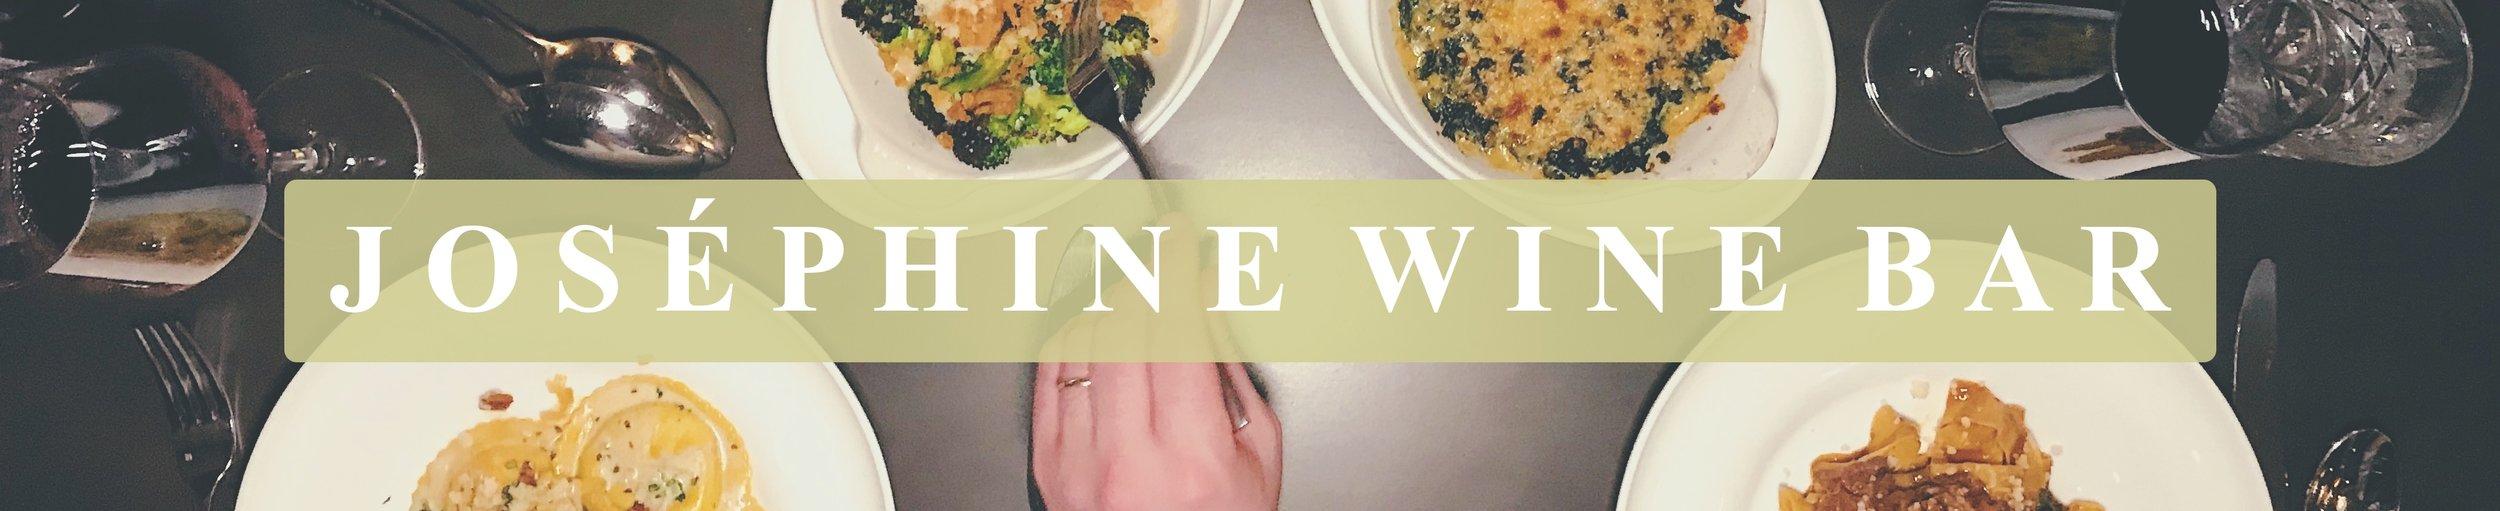 I Love That For You - Charleston Wine and Food Local Love List Josephine Wine Bar.jpg